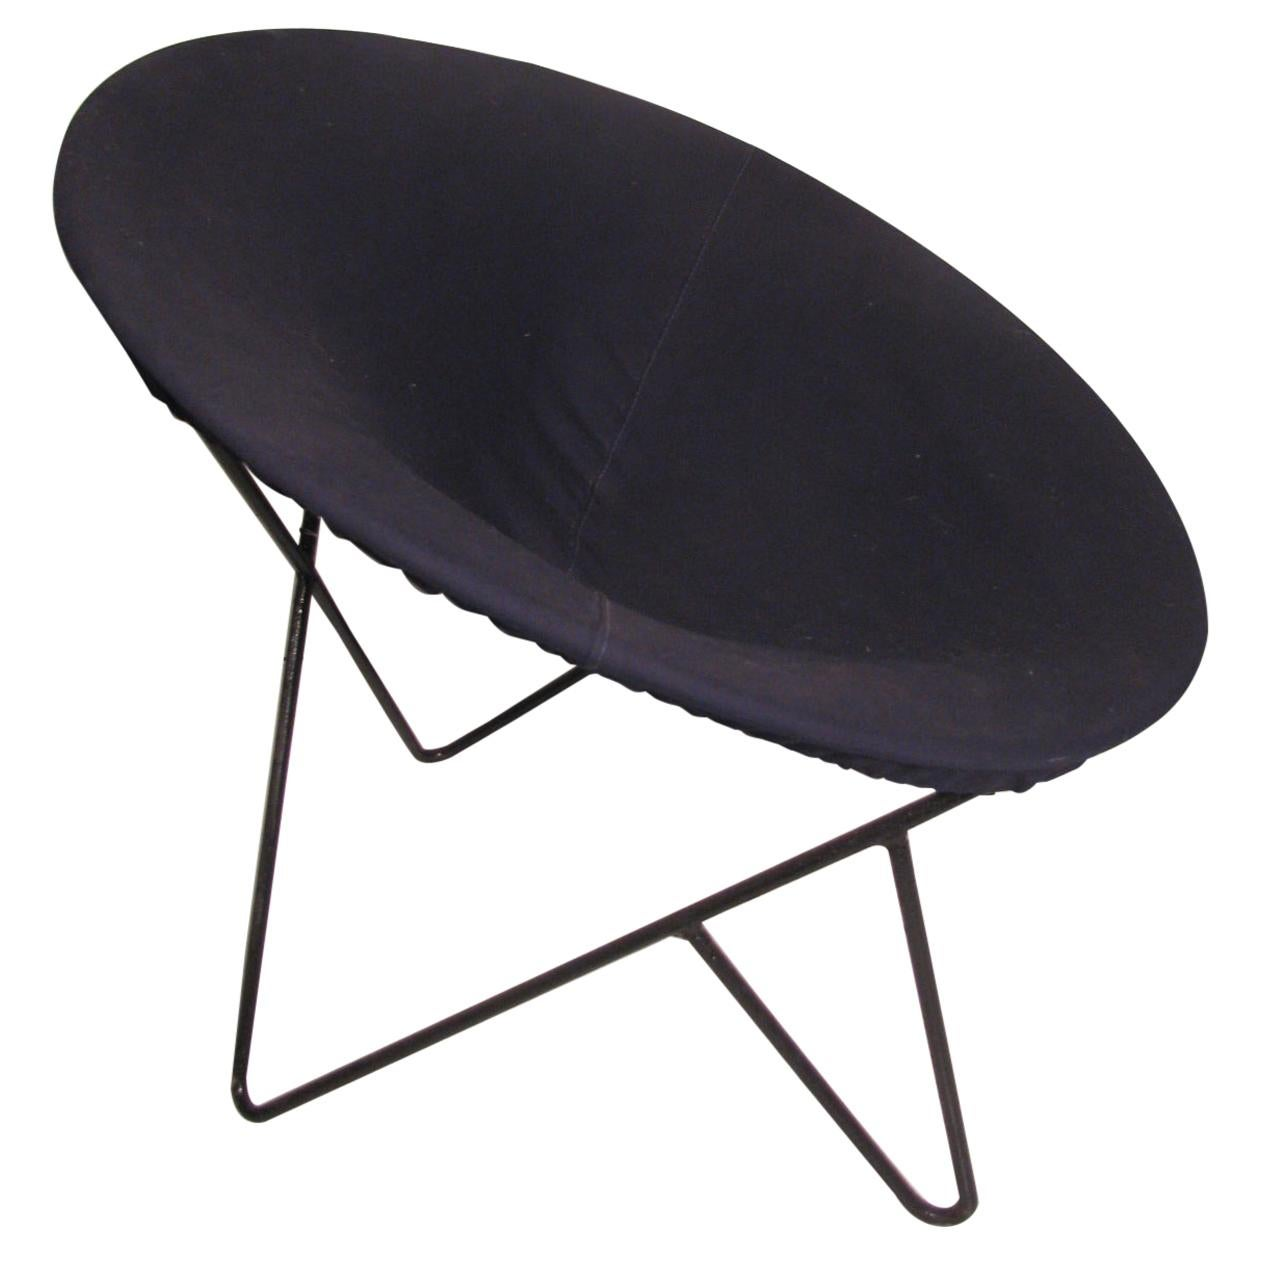 Mid-Century Modern Iron Hoop Lounge Chair, circa 1955